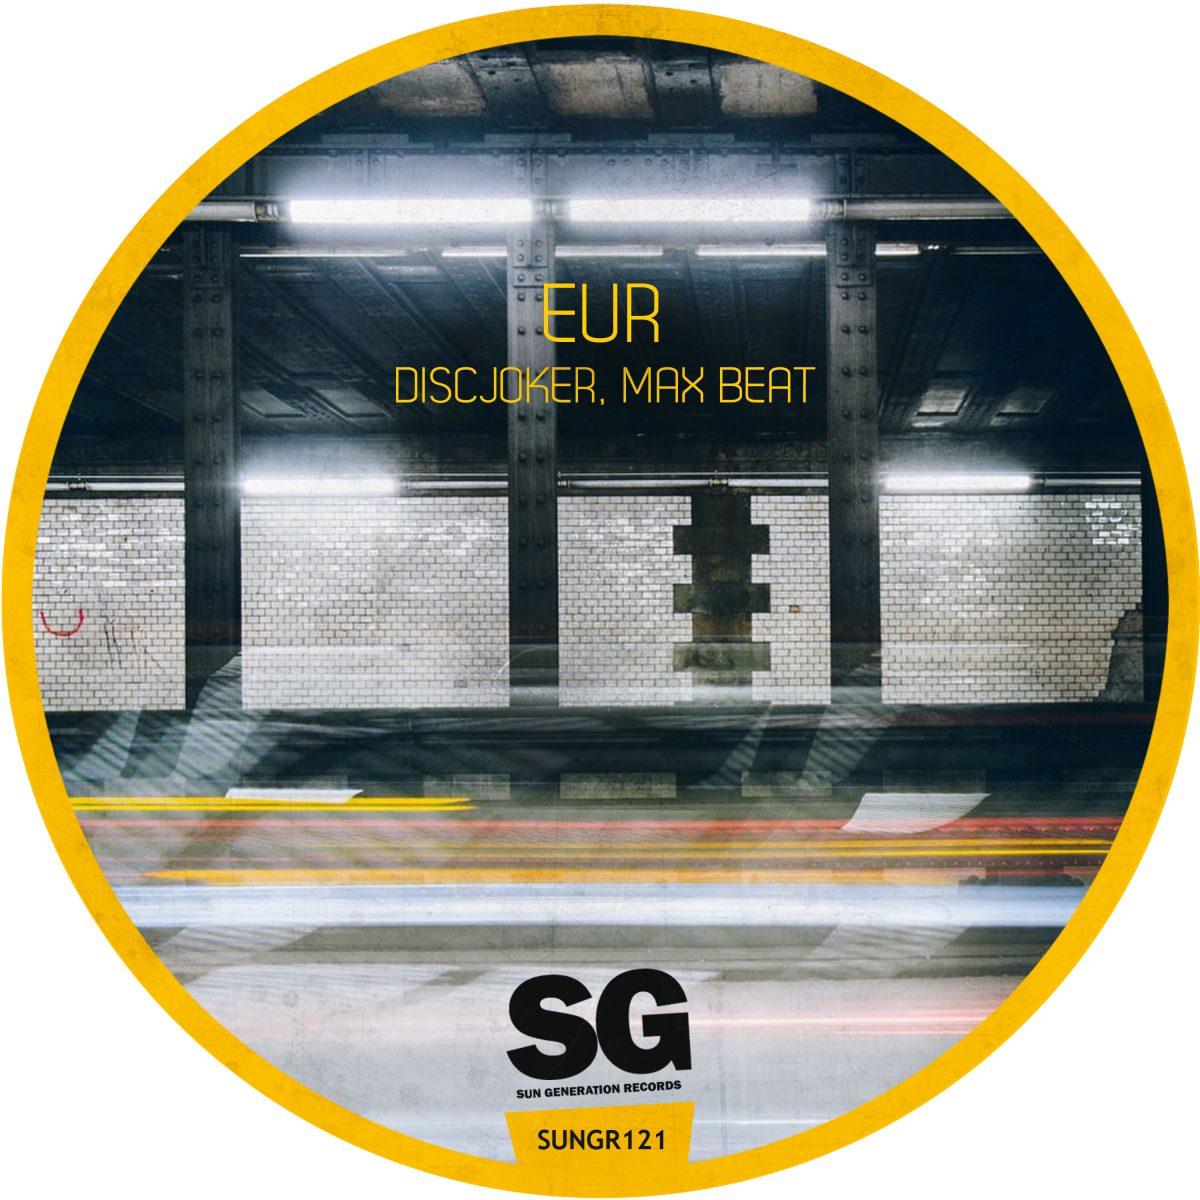 Eur DiscJoker / Max Beat